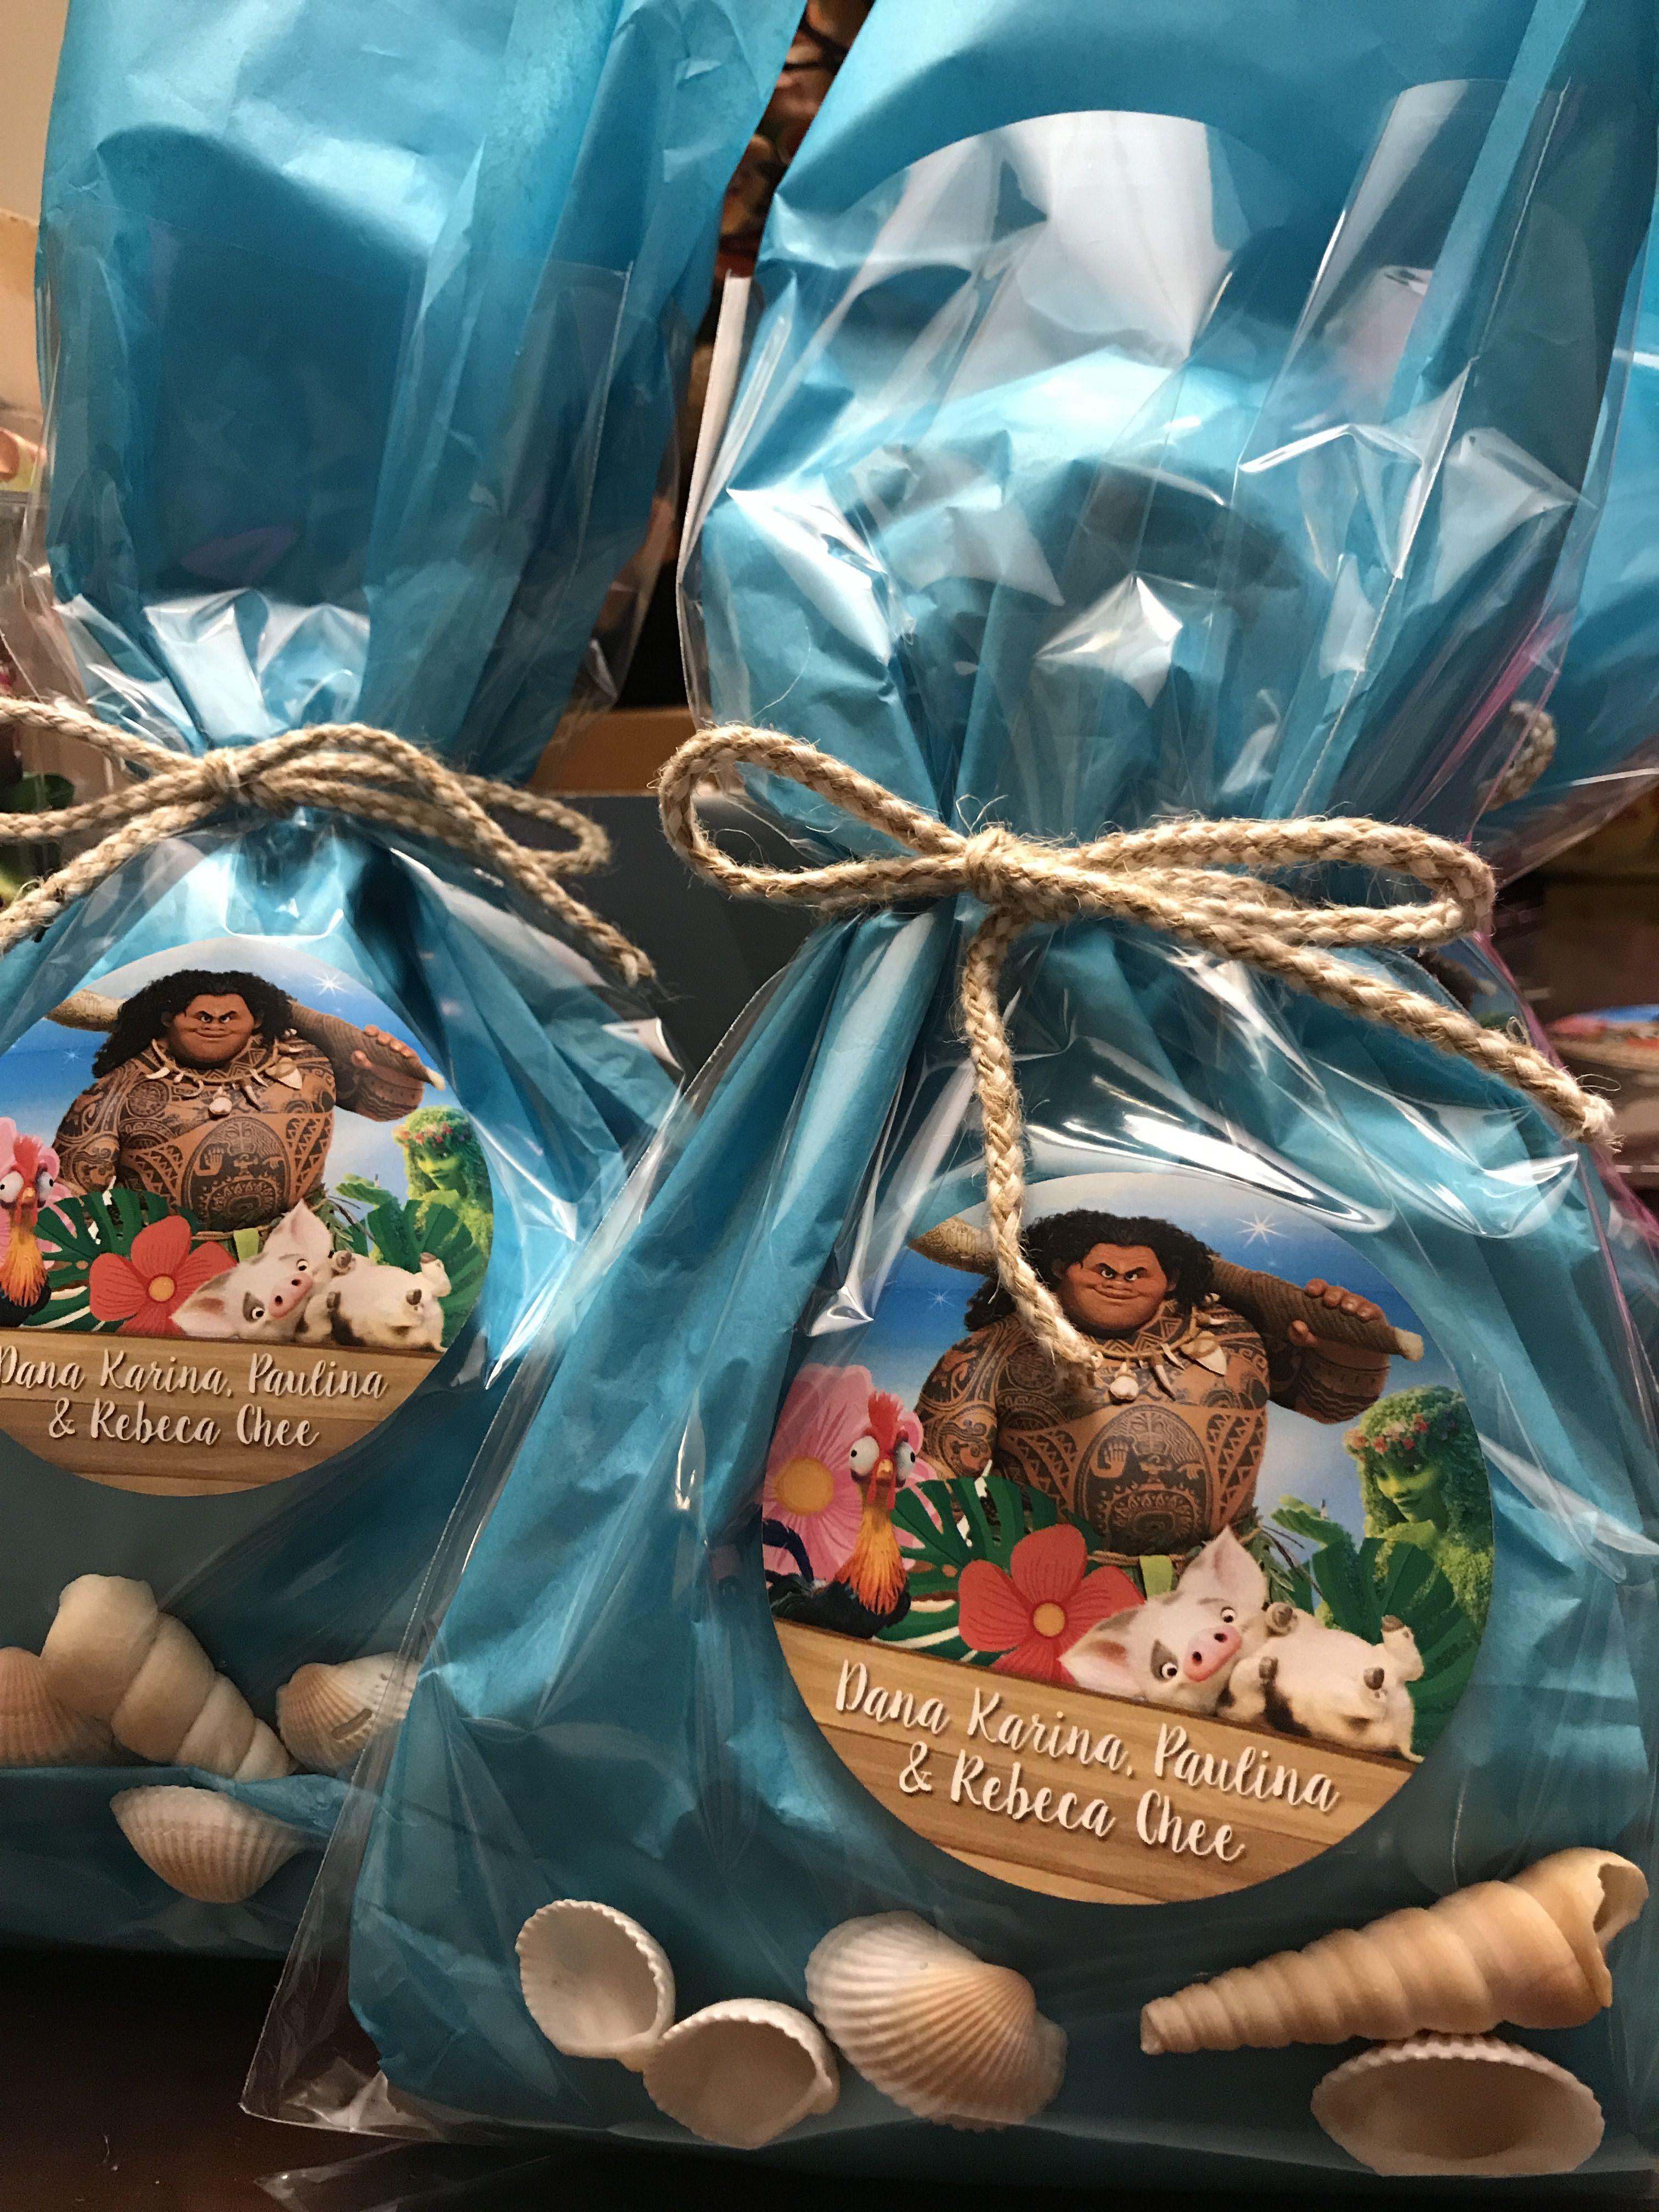 Maui From Moana Movie Party Favor Bag For Boys